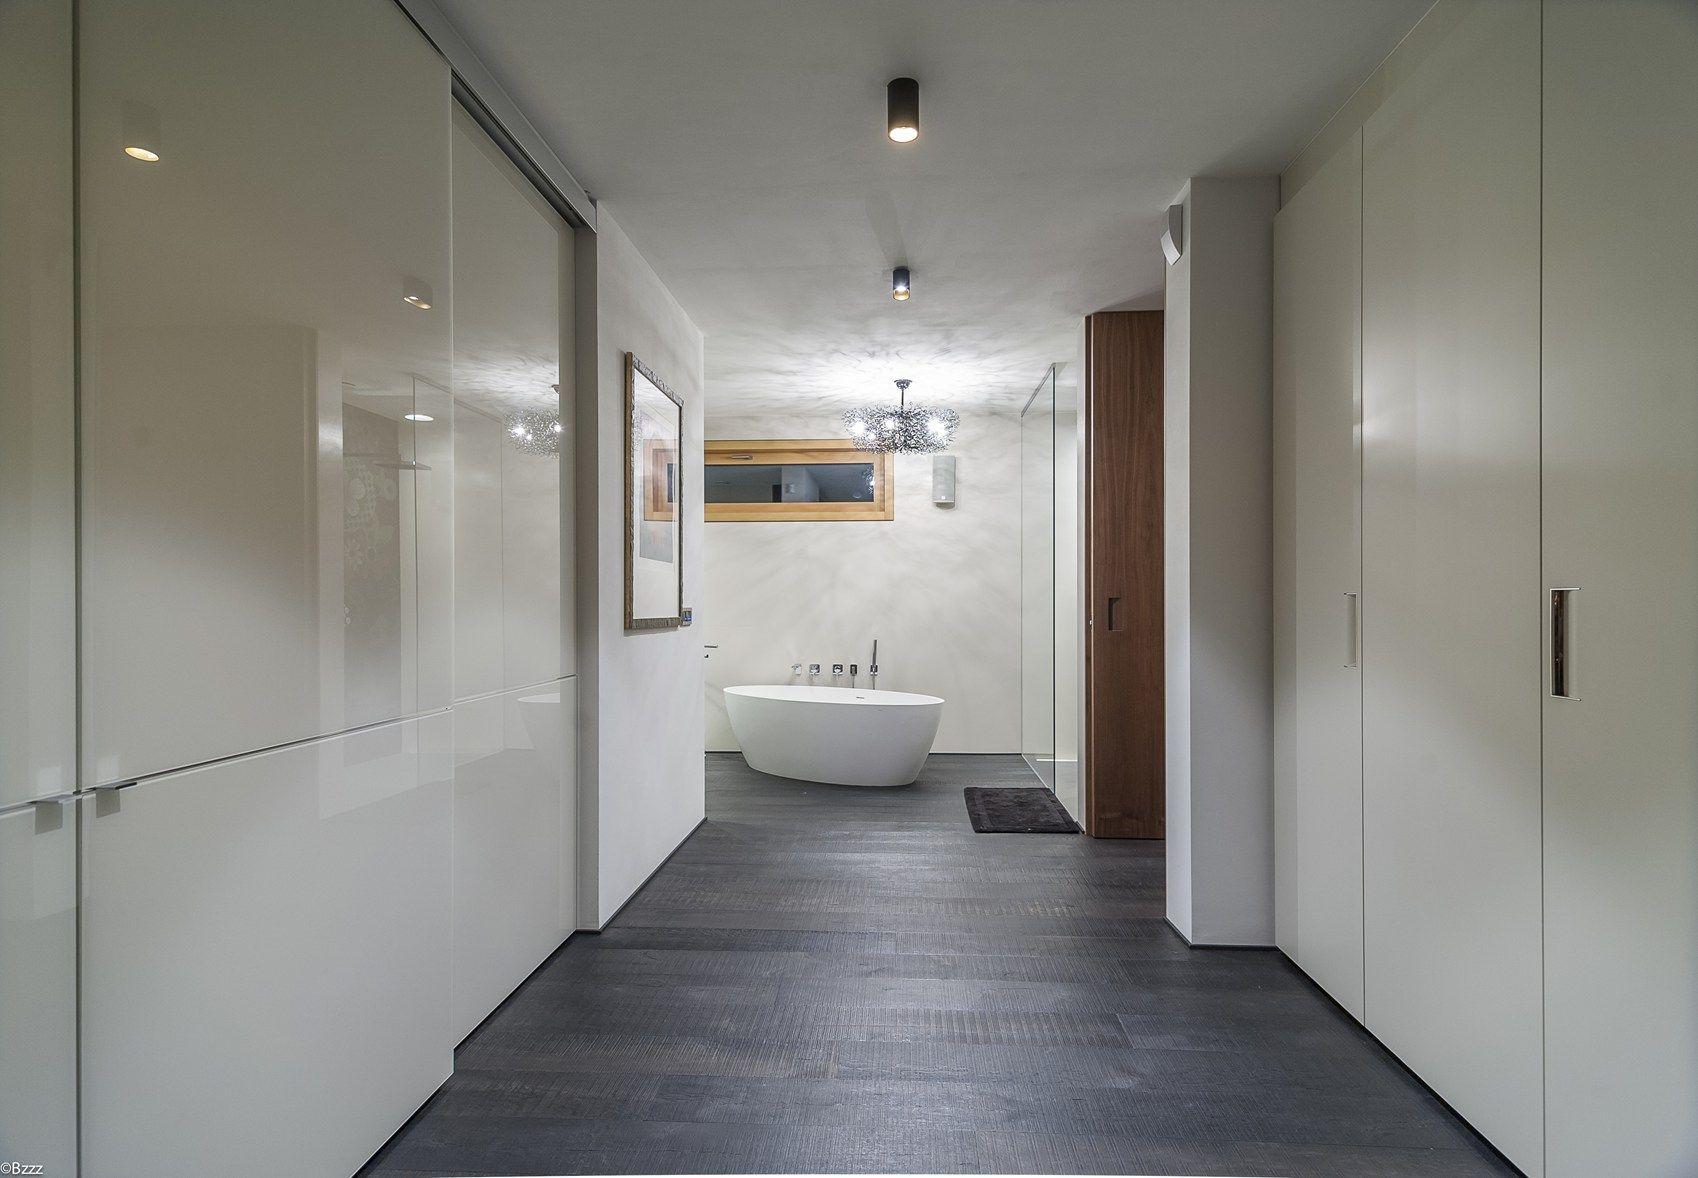 Bathroom Lighting According To Modular